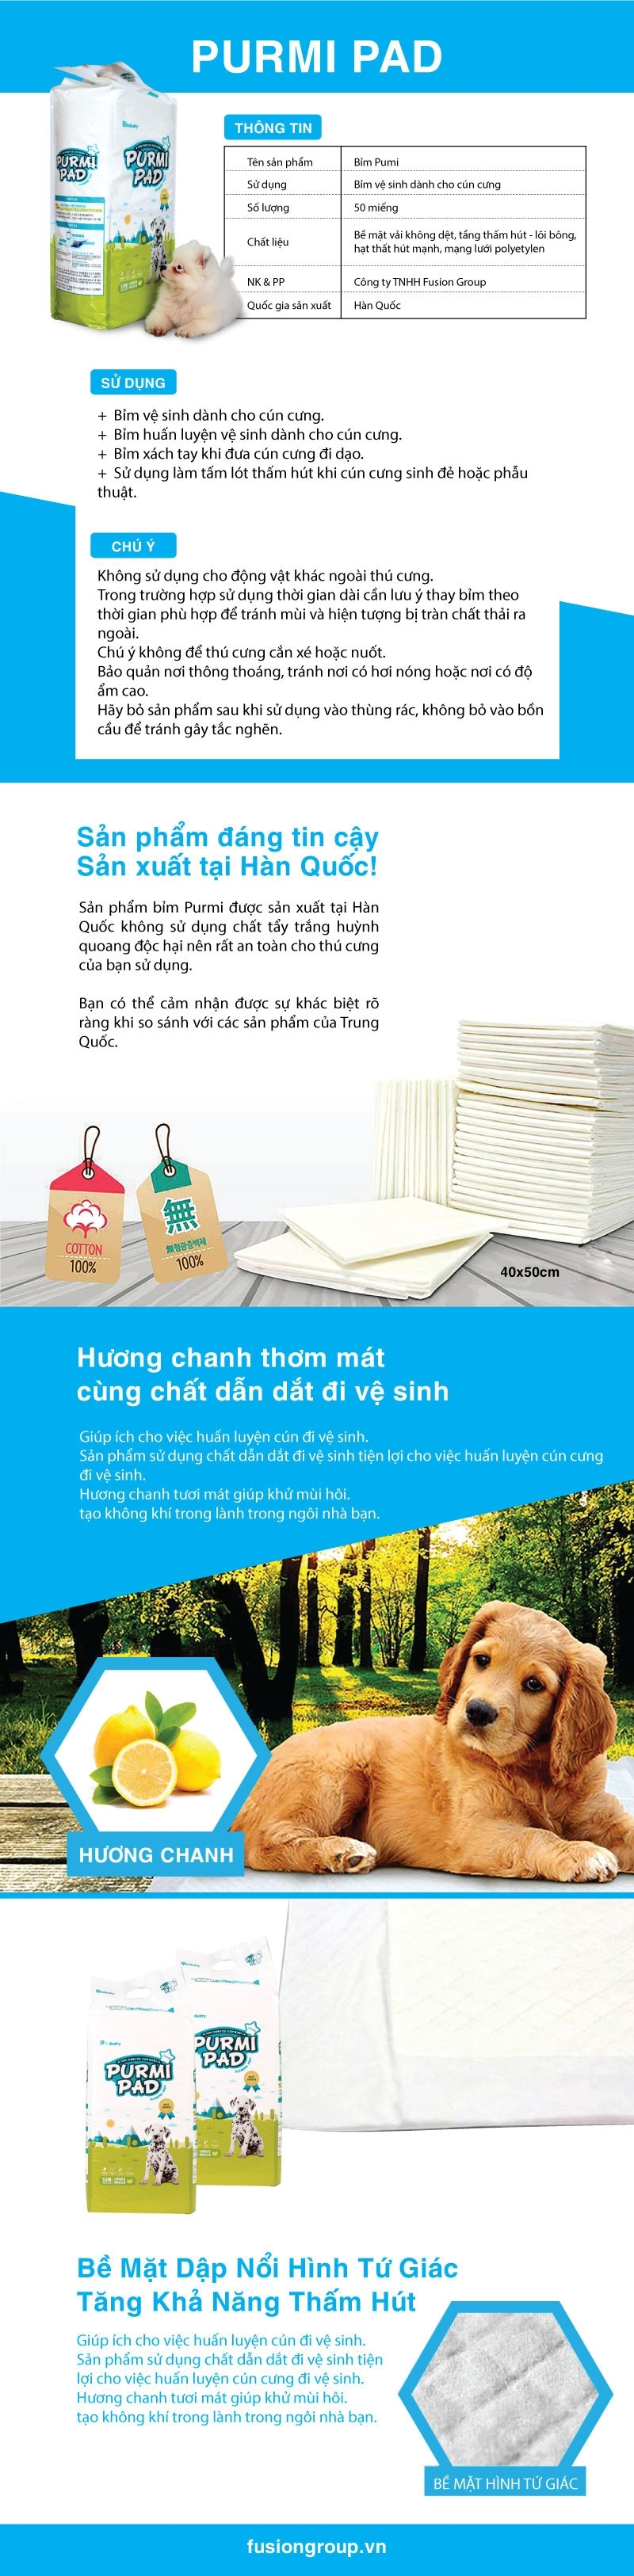 bim-ve-sinh-cho-cho-purmi-pad-1582611222.jpg